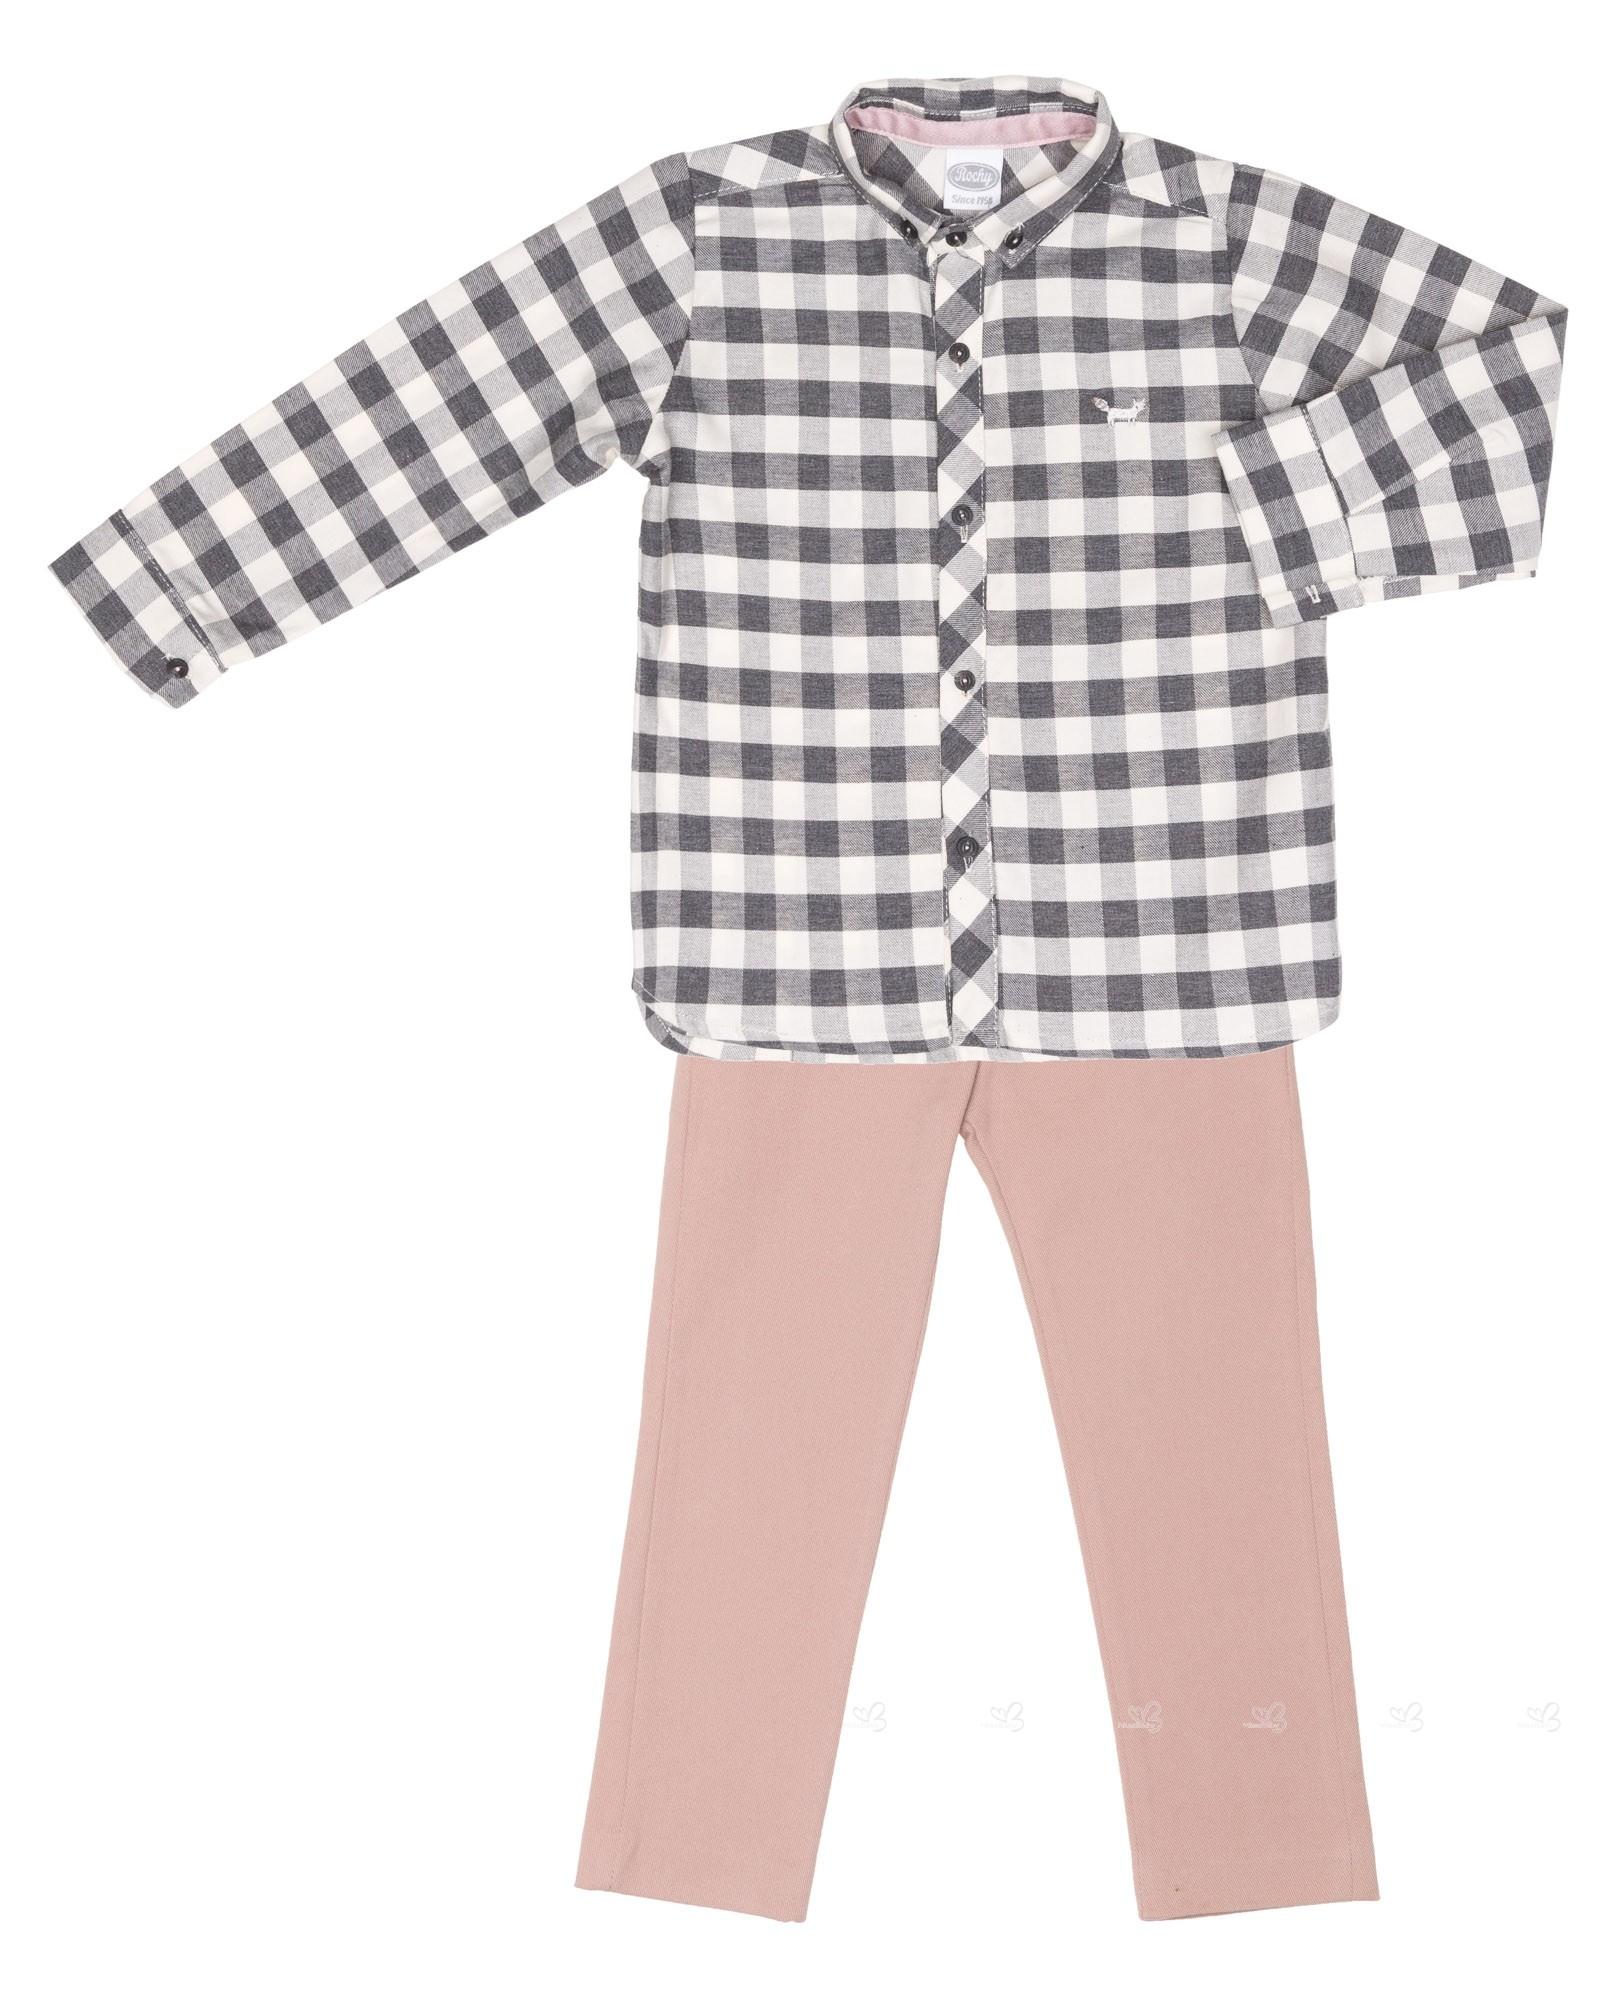 73b01541 Rochy Boys Gray Gingham Shirt & Pink Trousers Set | Missbaby